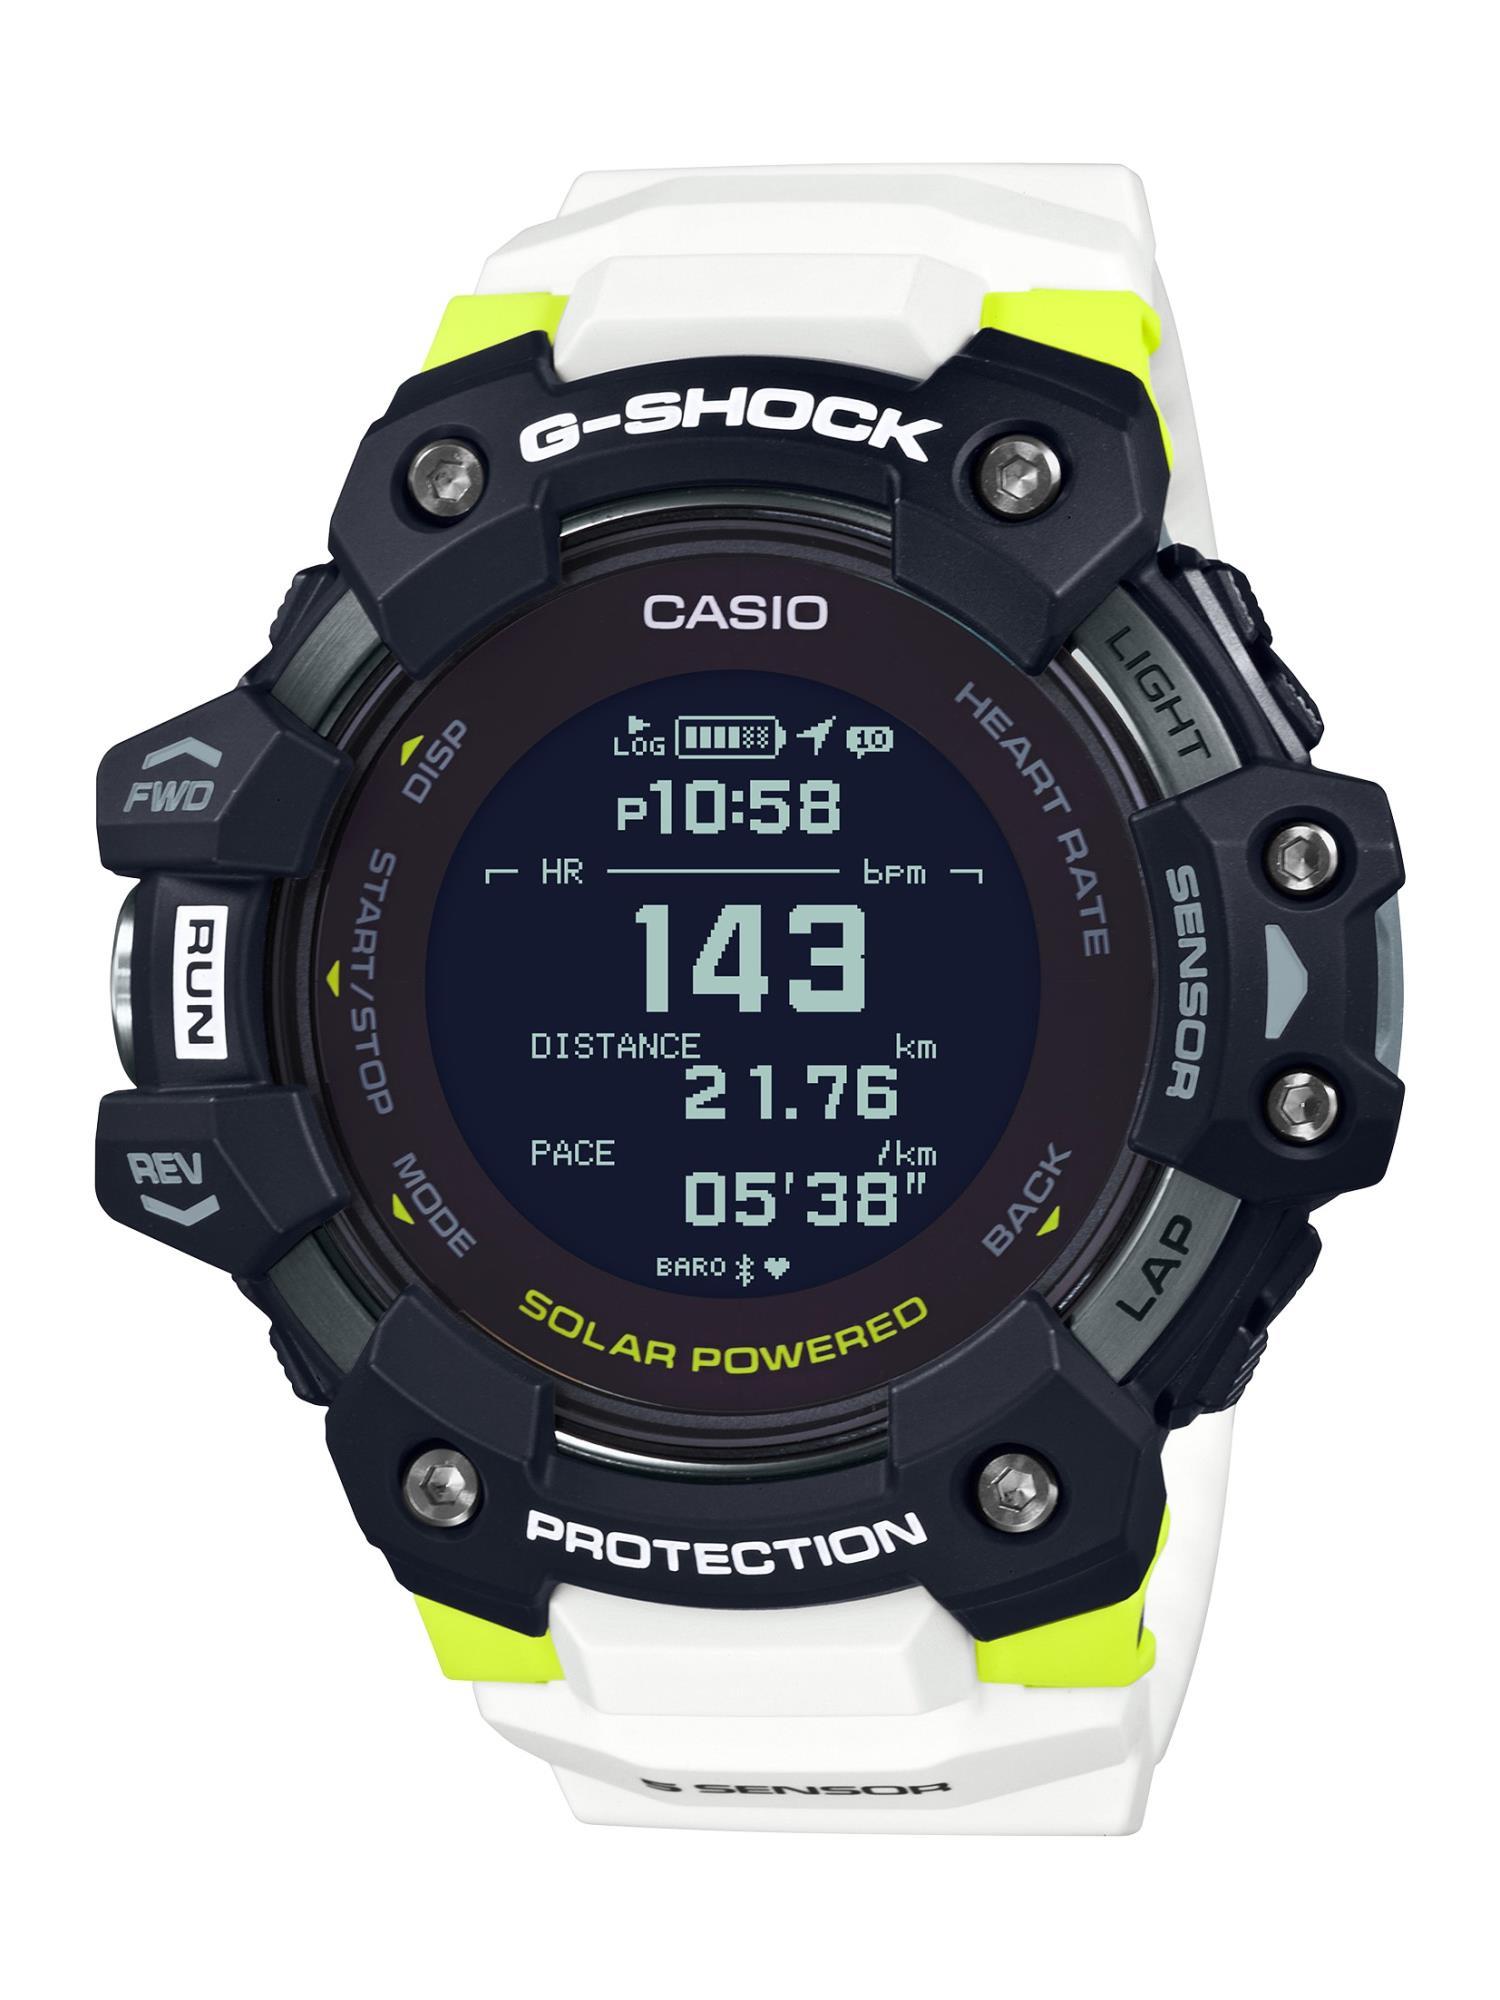 G-SHOCK G-SQUAD GBD-H1000-1A7ER - G-SHOCK